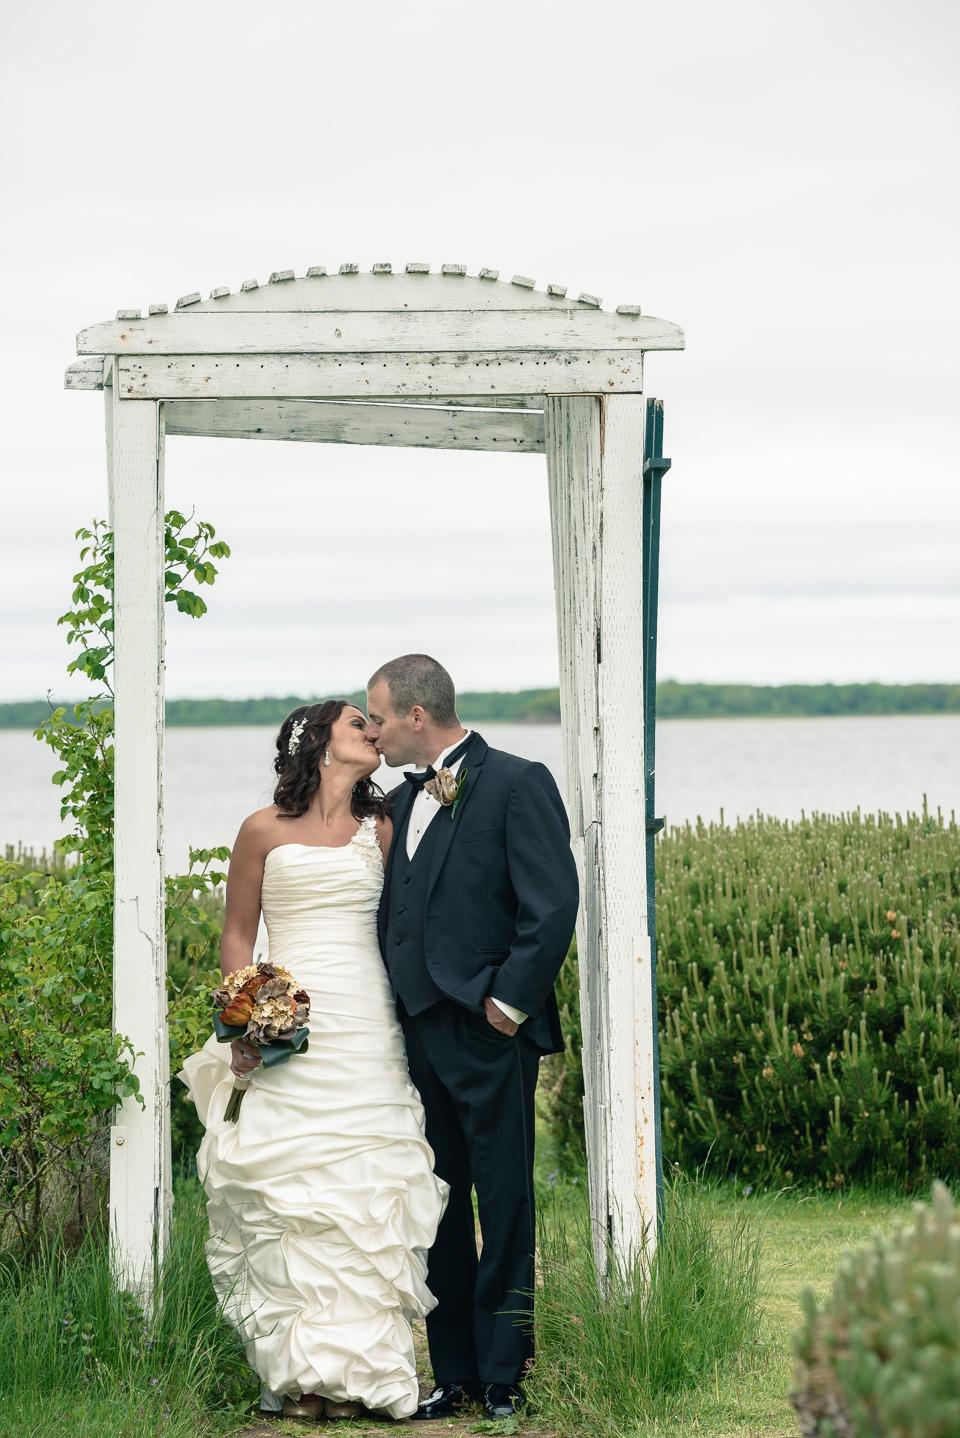 NIgel Fearon Photography | The LeBlanc Wedding-54.jpg